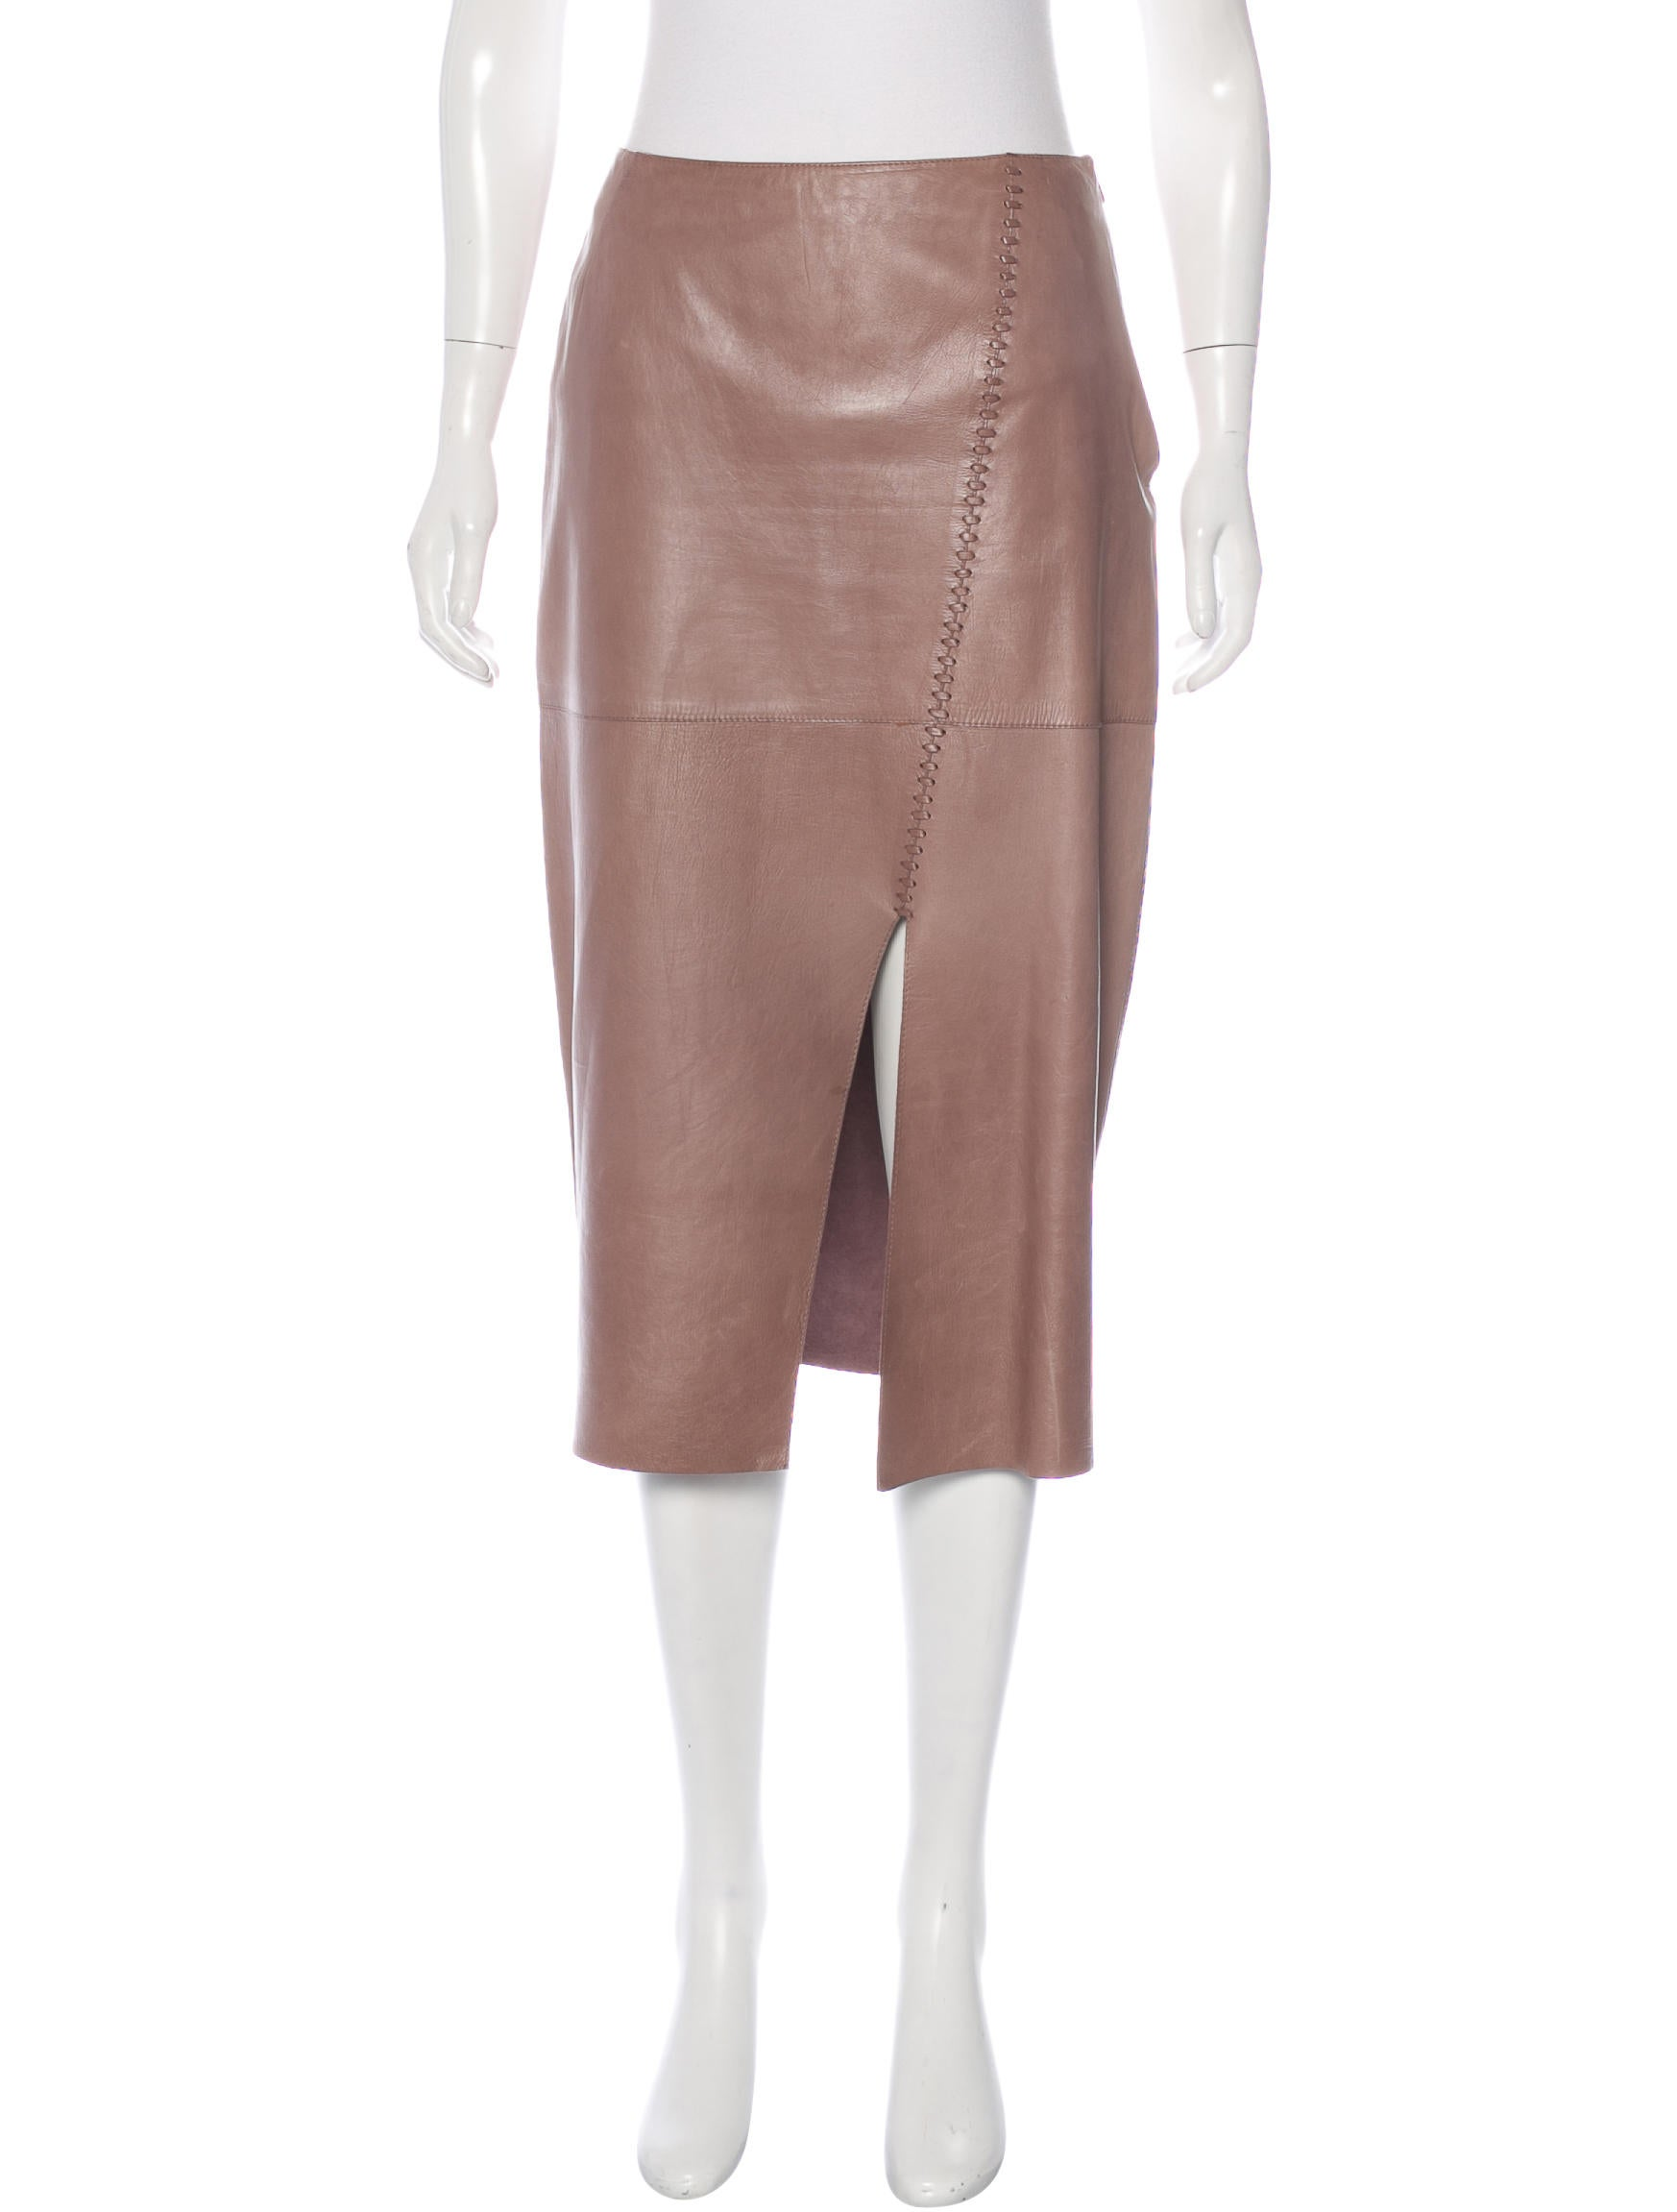 genny leather knee length skirt clothing gen20113